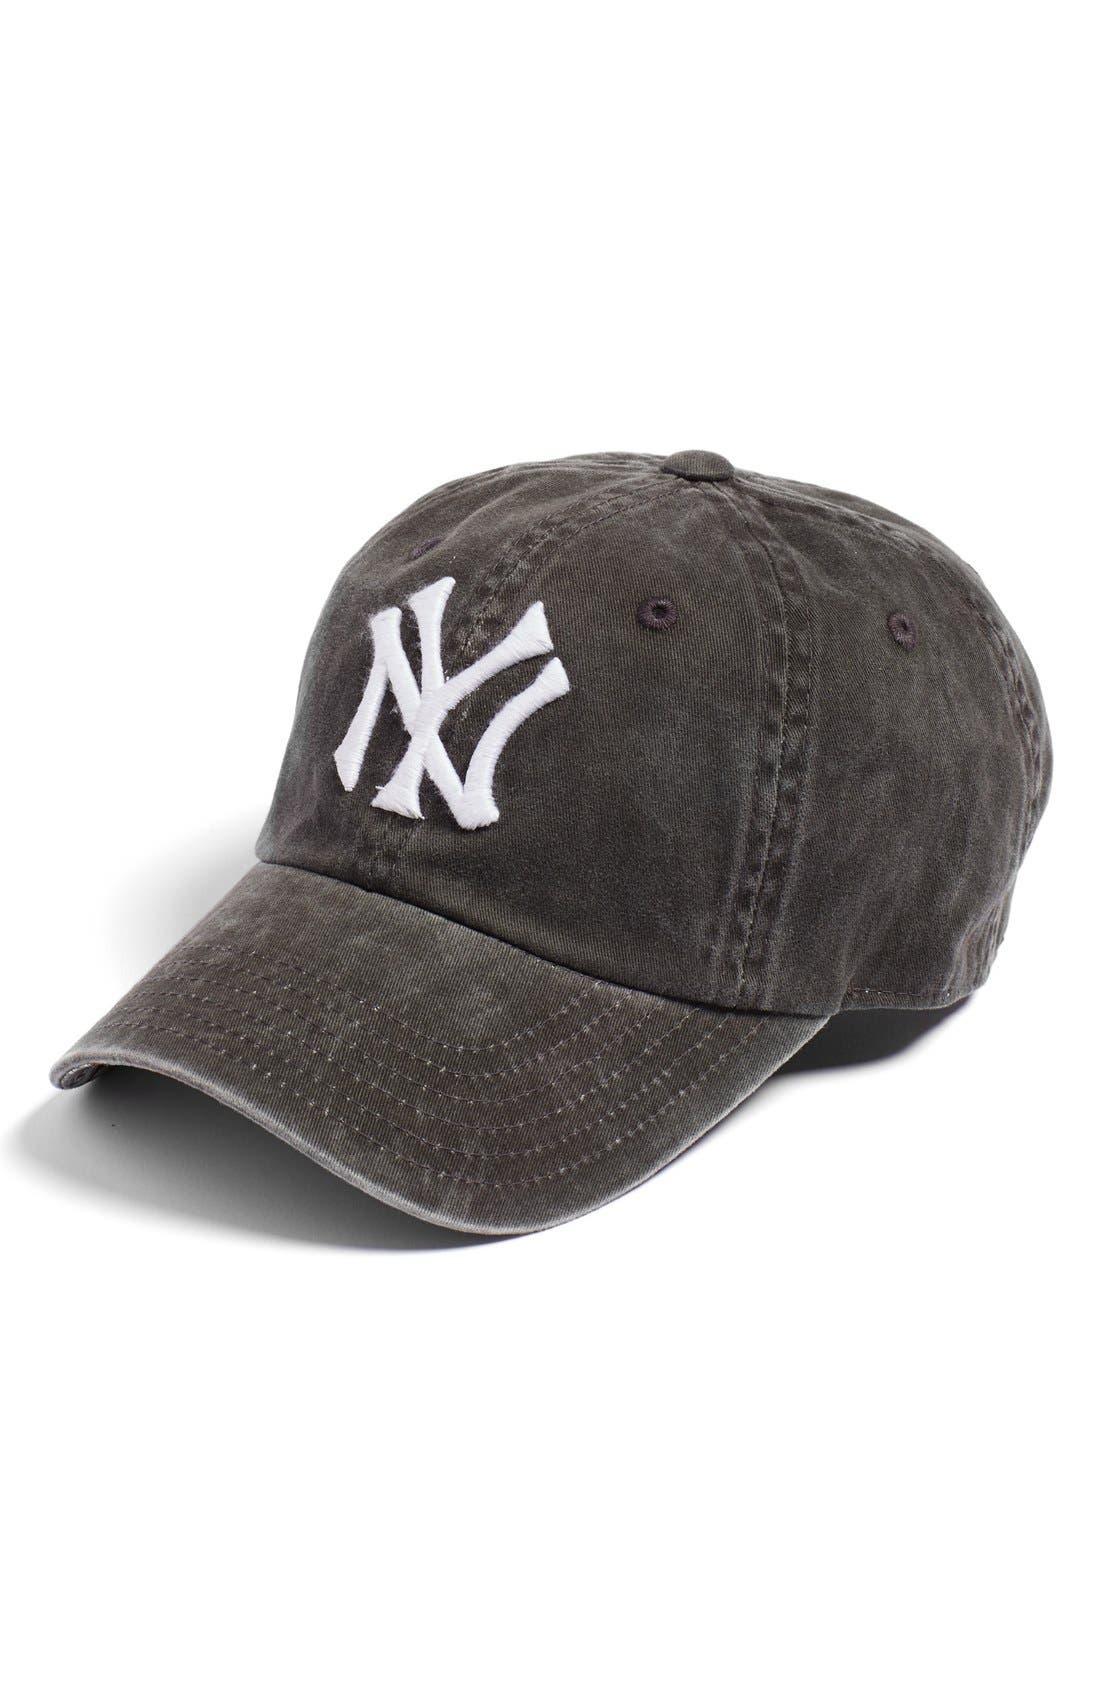 Main Image - American Needle New Raglan New York Yankees Baseball Cap